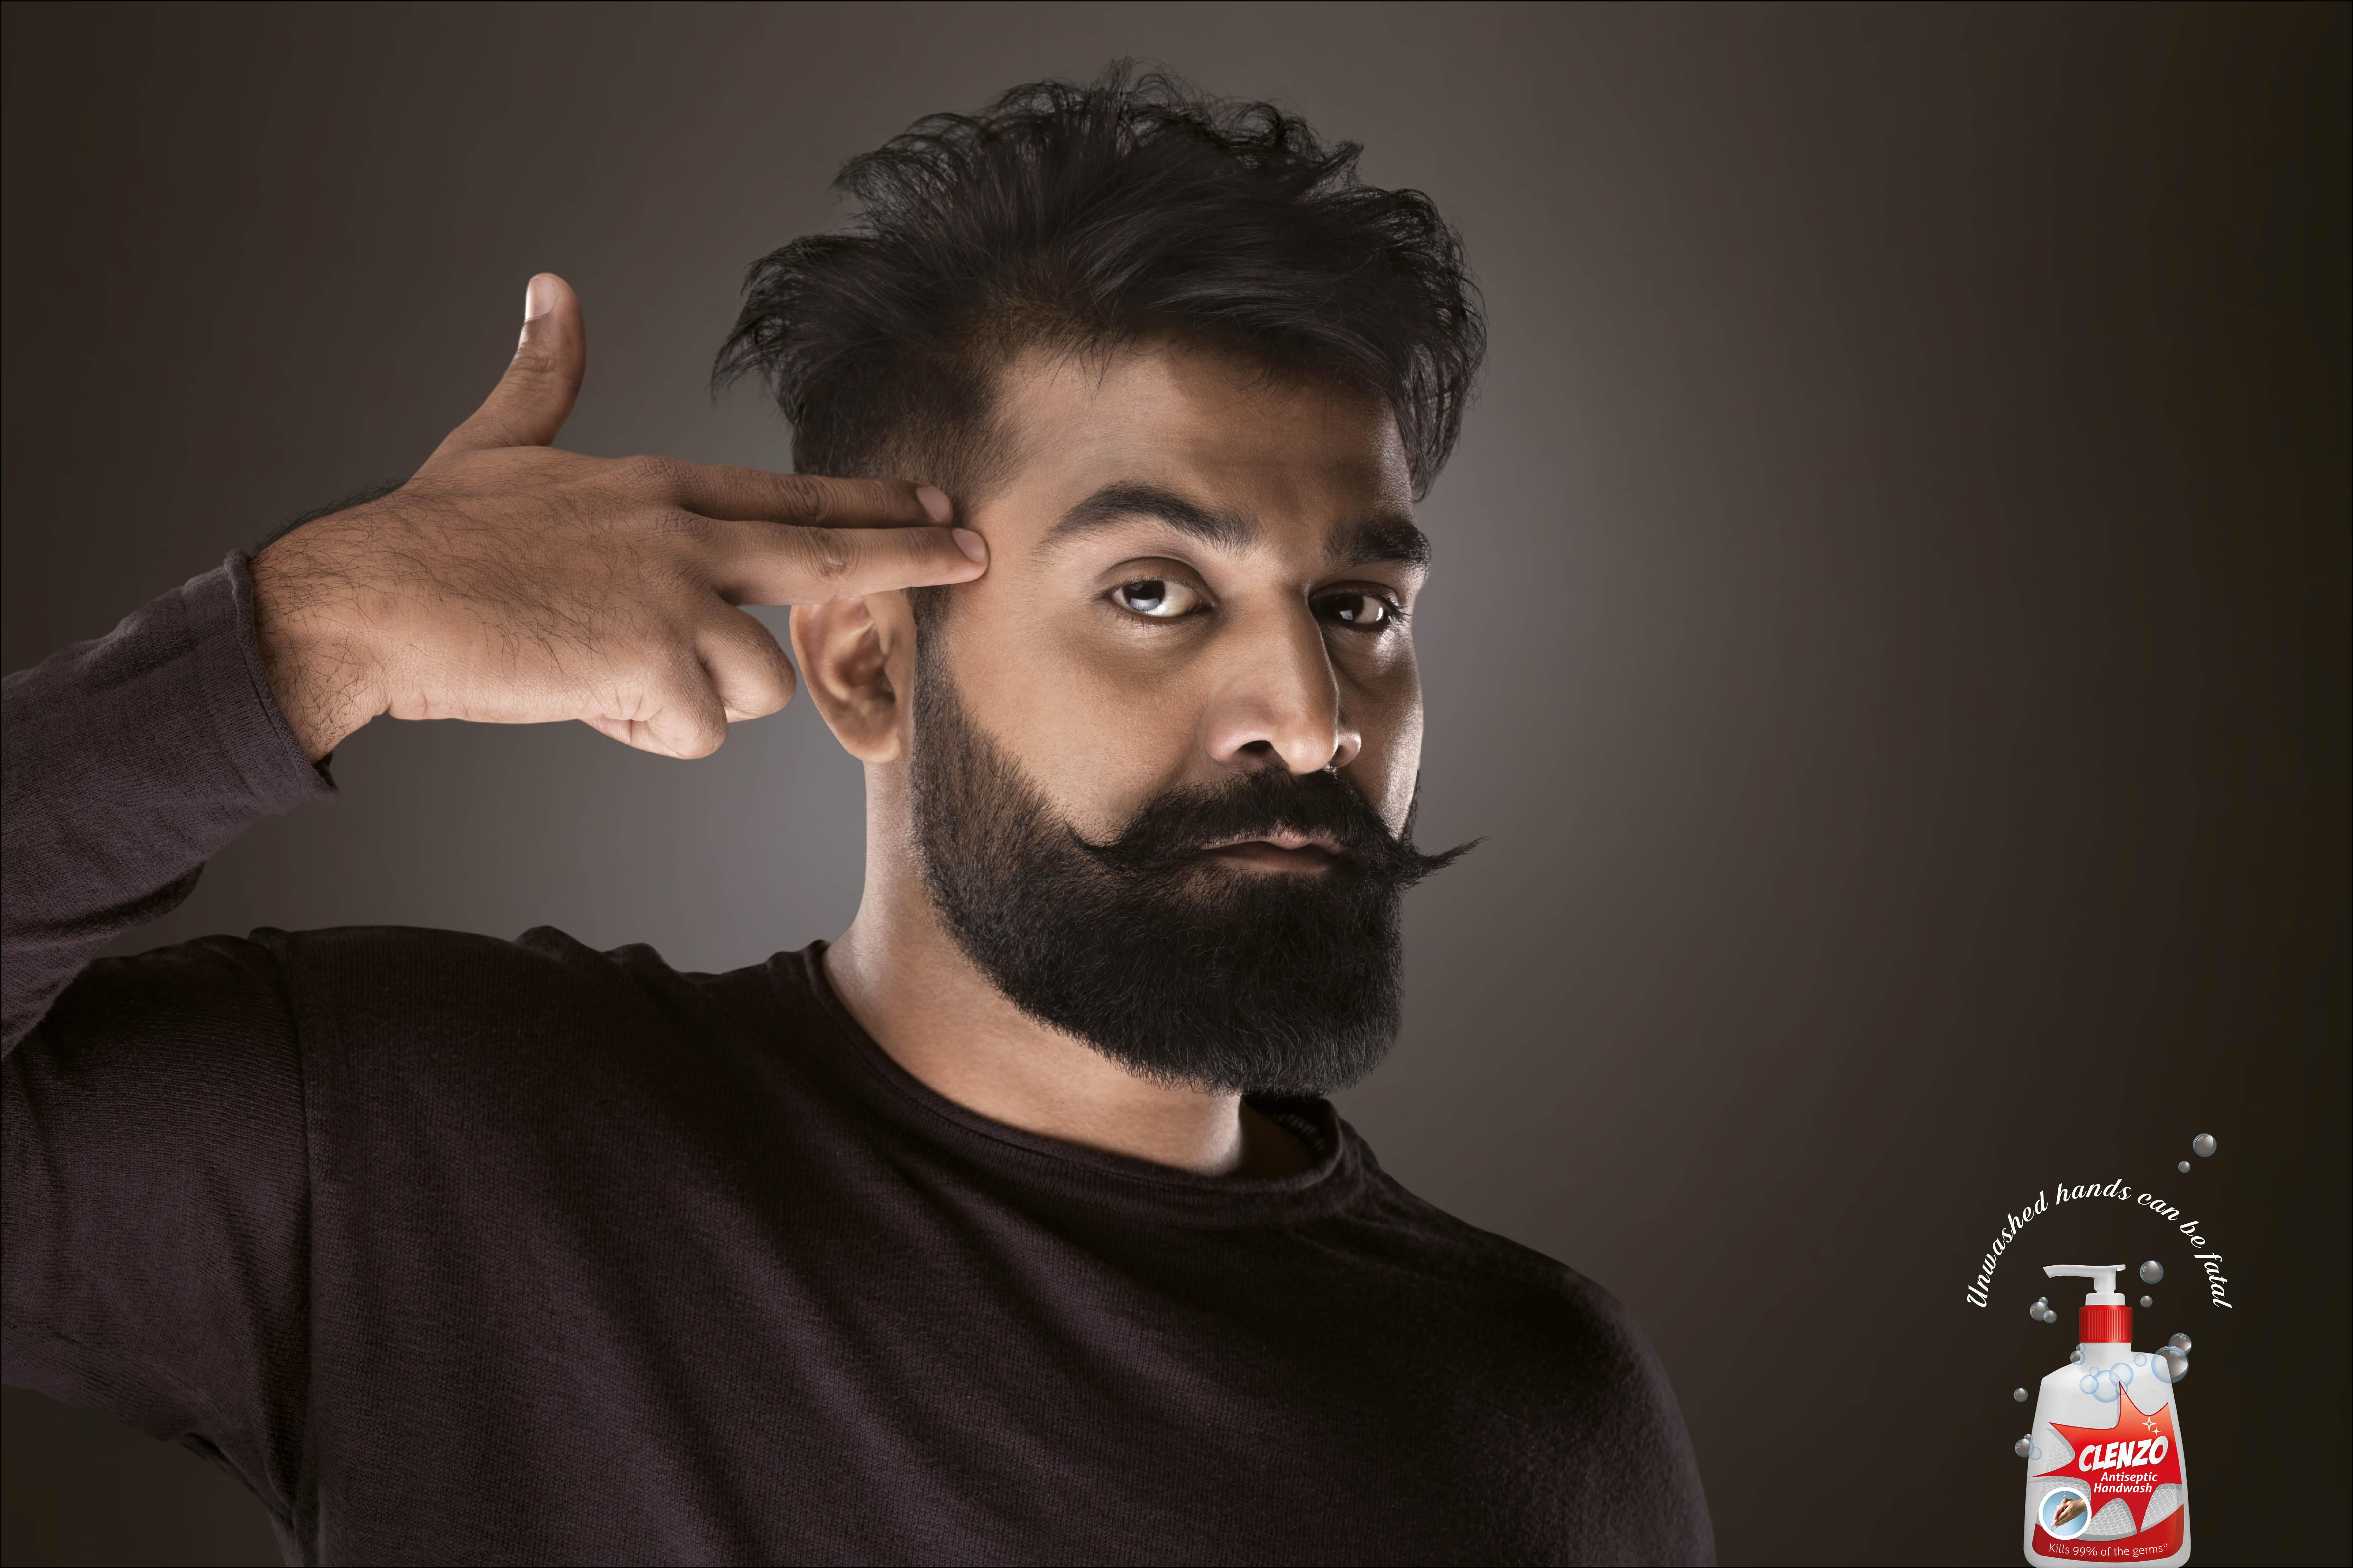 Clenzo Print Ad - Fatal hands - man